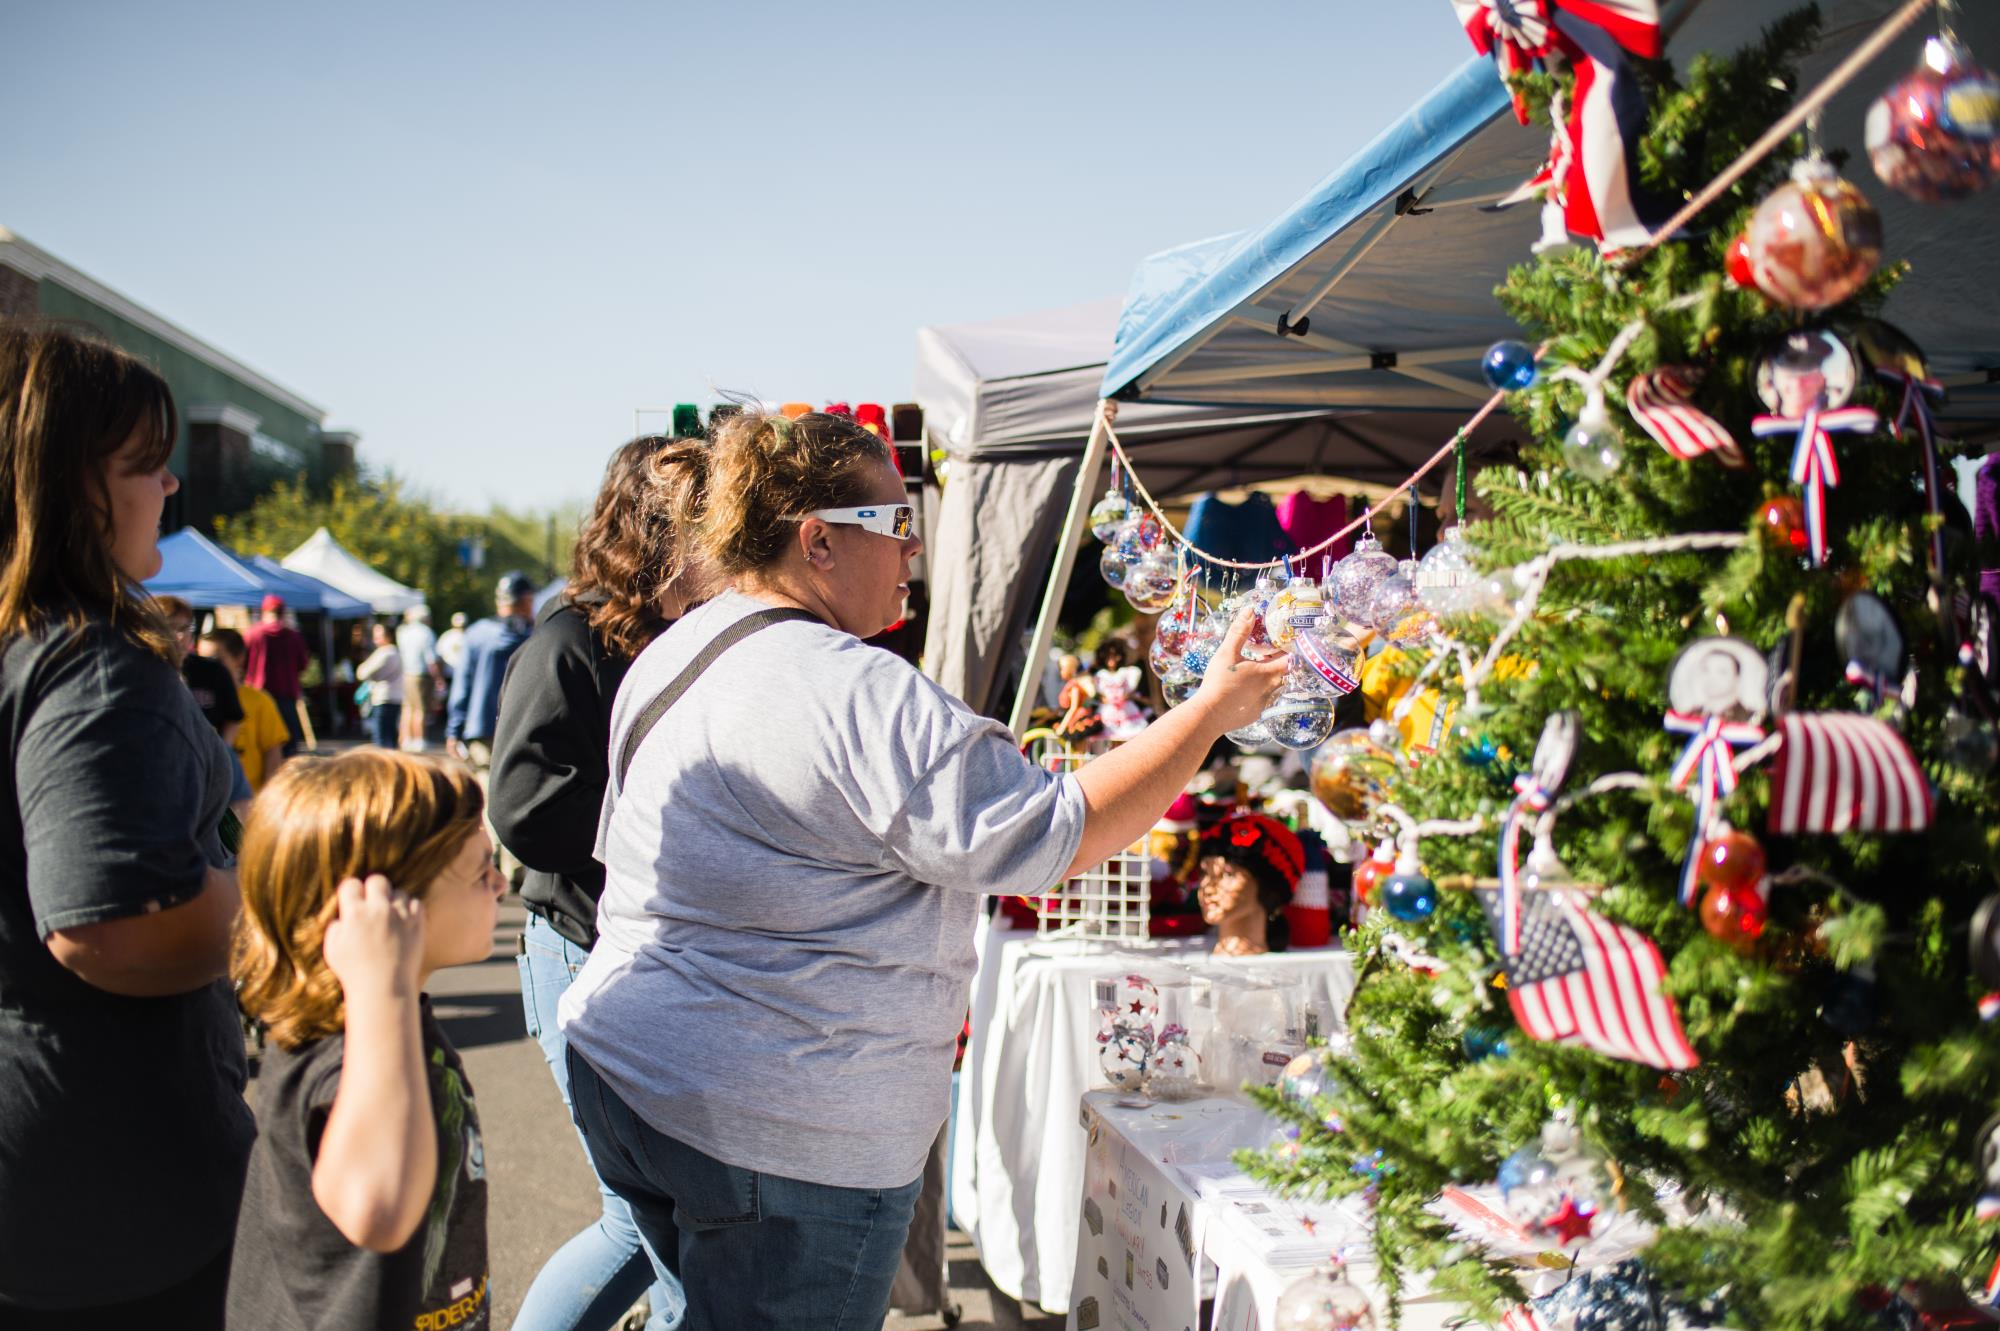 Christmas Events Going On In Buckeye Az 2020 Hometown Holiday Boutique | City of Buckeye